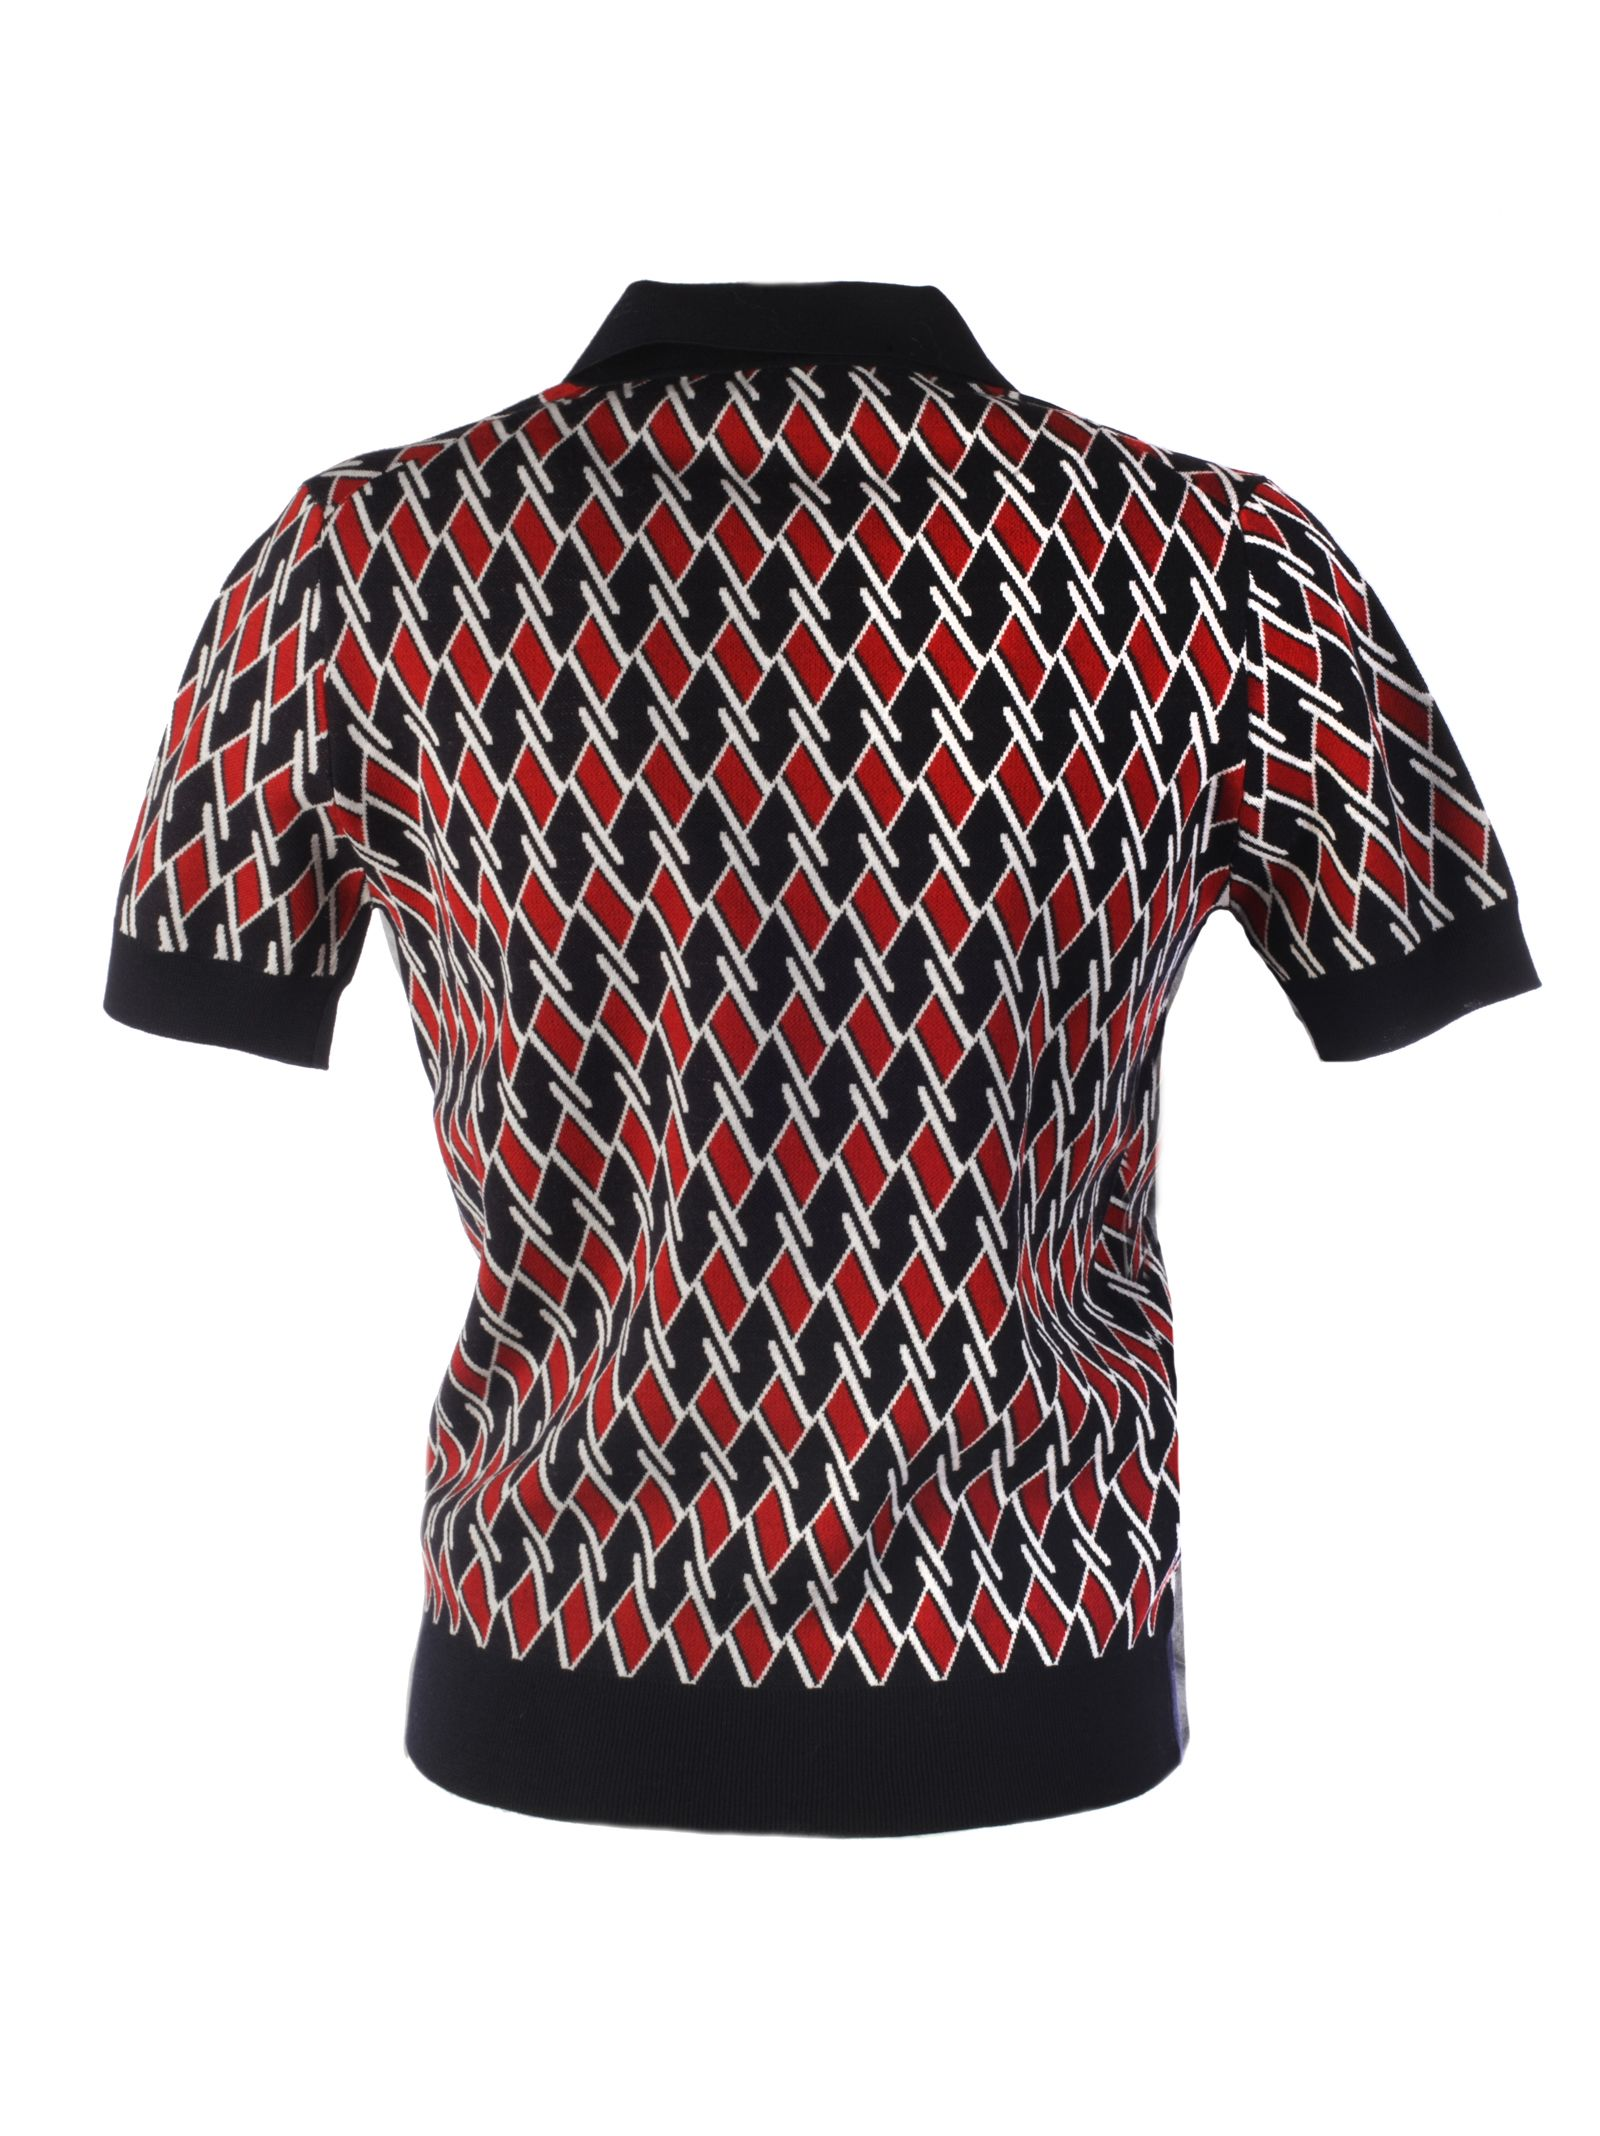 17d521fa55ce1 Prada Geometric Polo Shirt - Basic Prada Geometric Polo Shirt - Basic